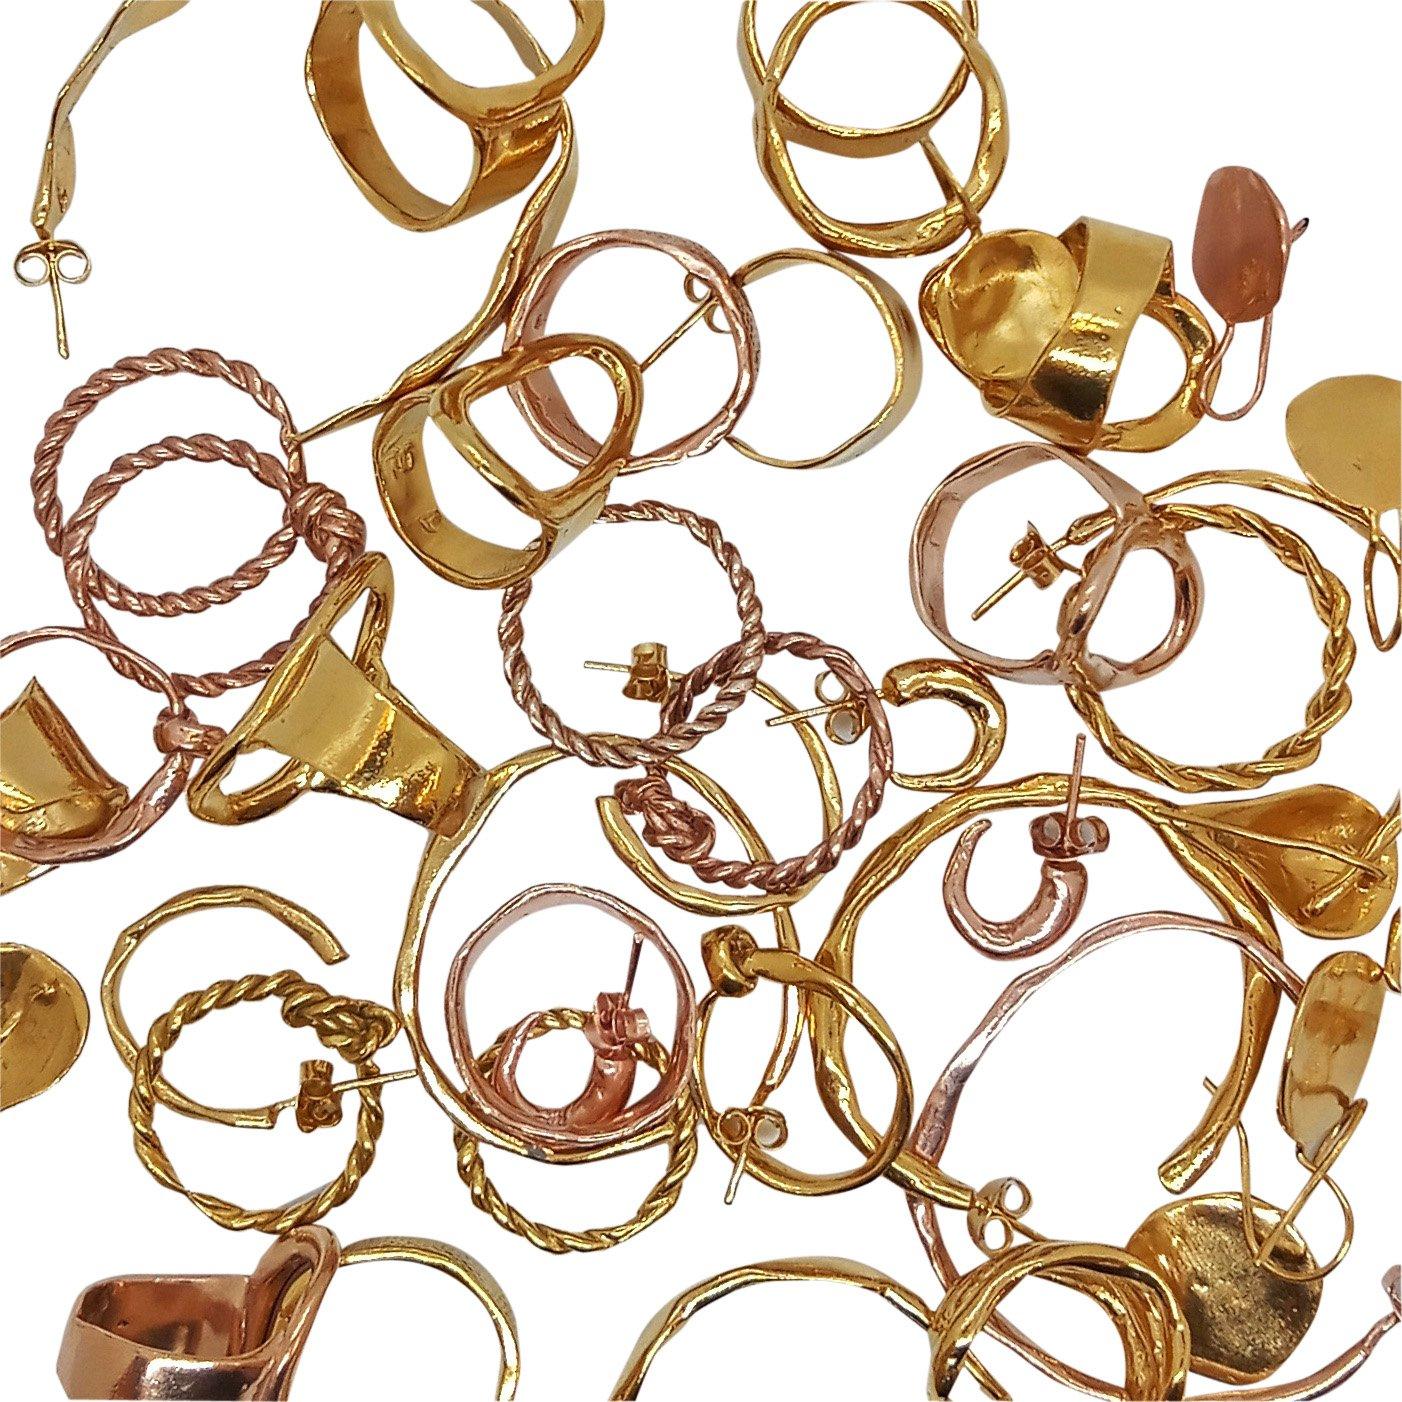 Image of Baño de oro/ Gold-Plating